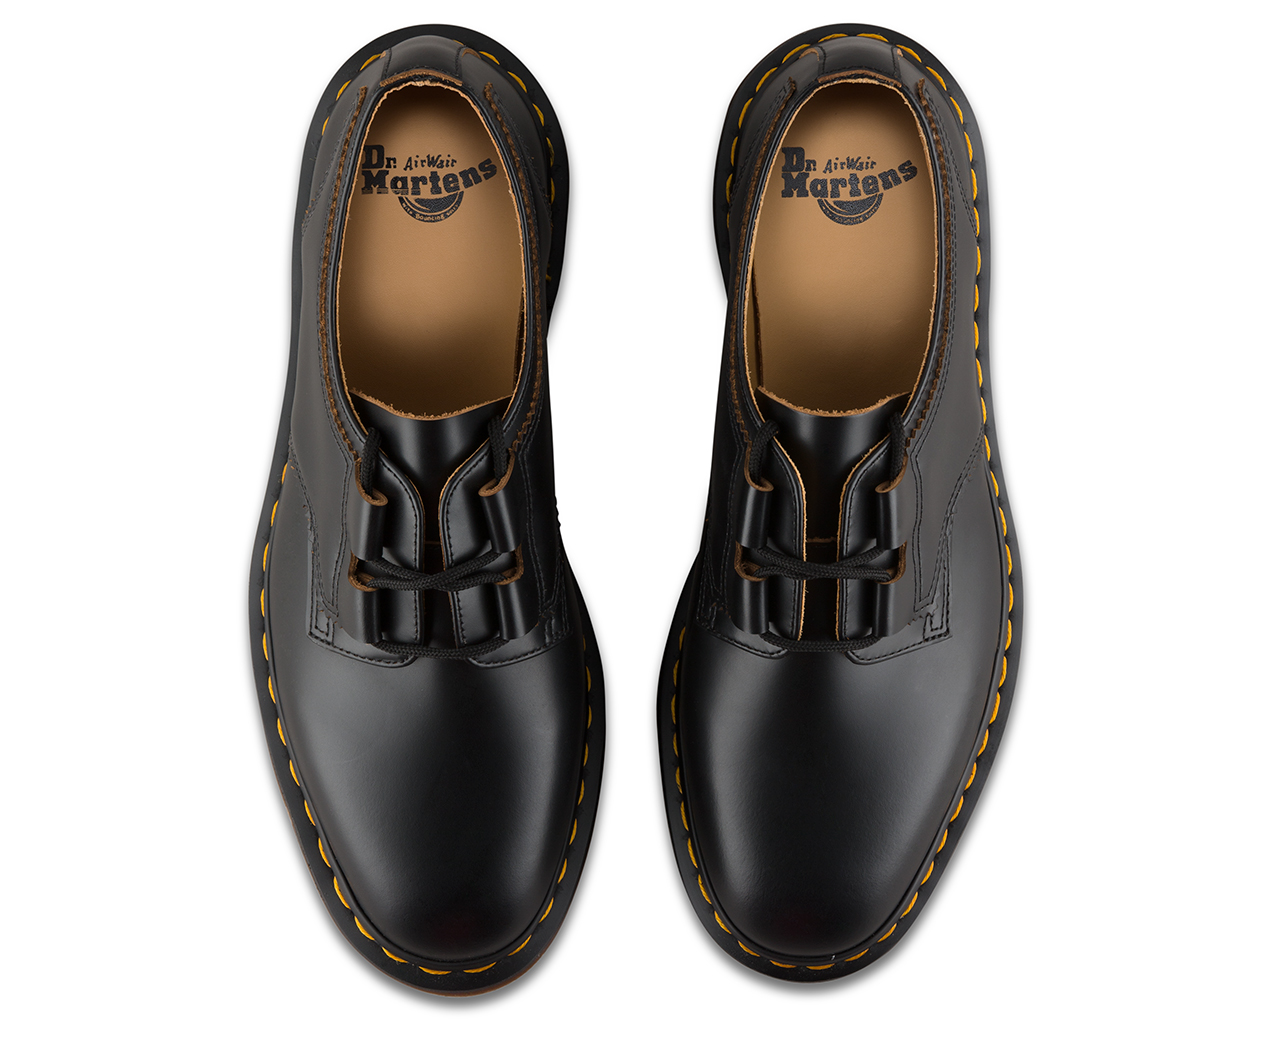 Dr Martens Chaussures Henton Ghillie En Noir Lisse - Noir luLr05fba